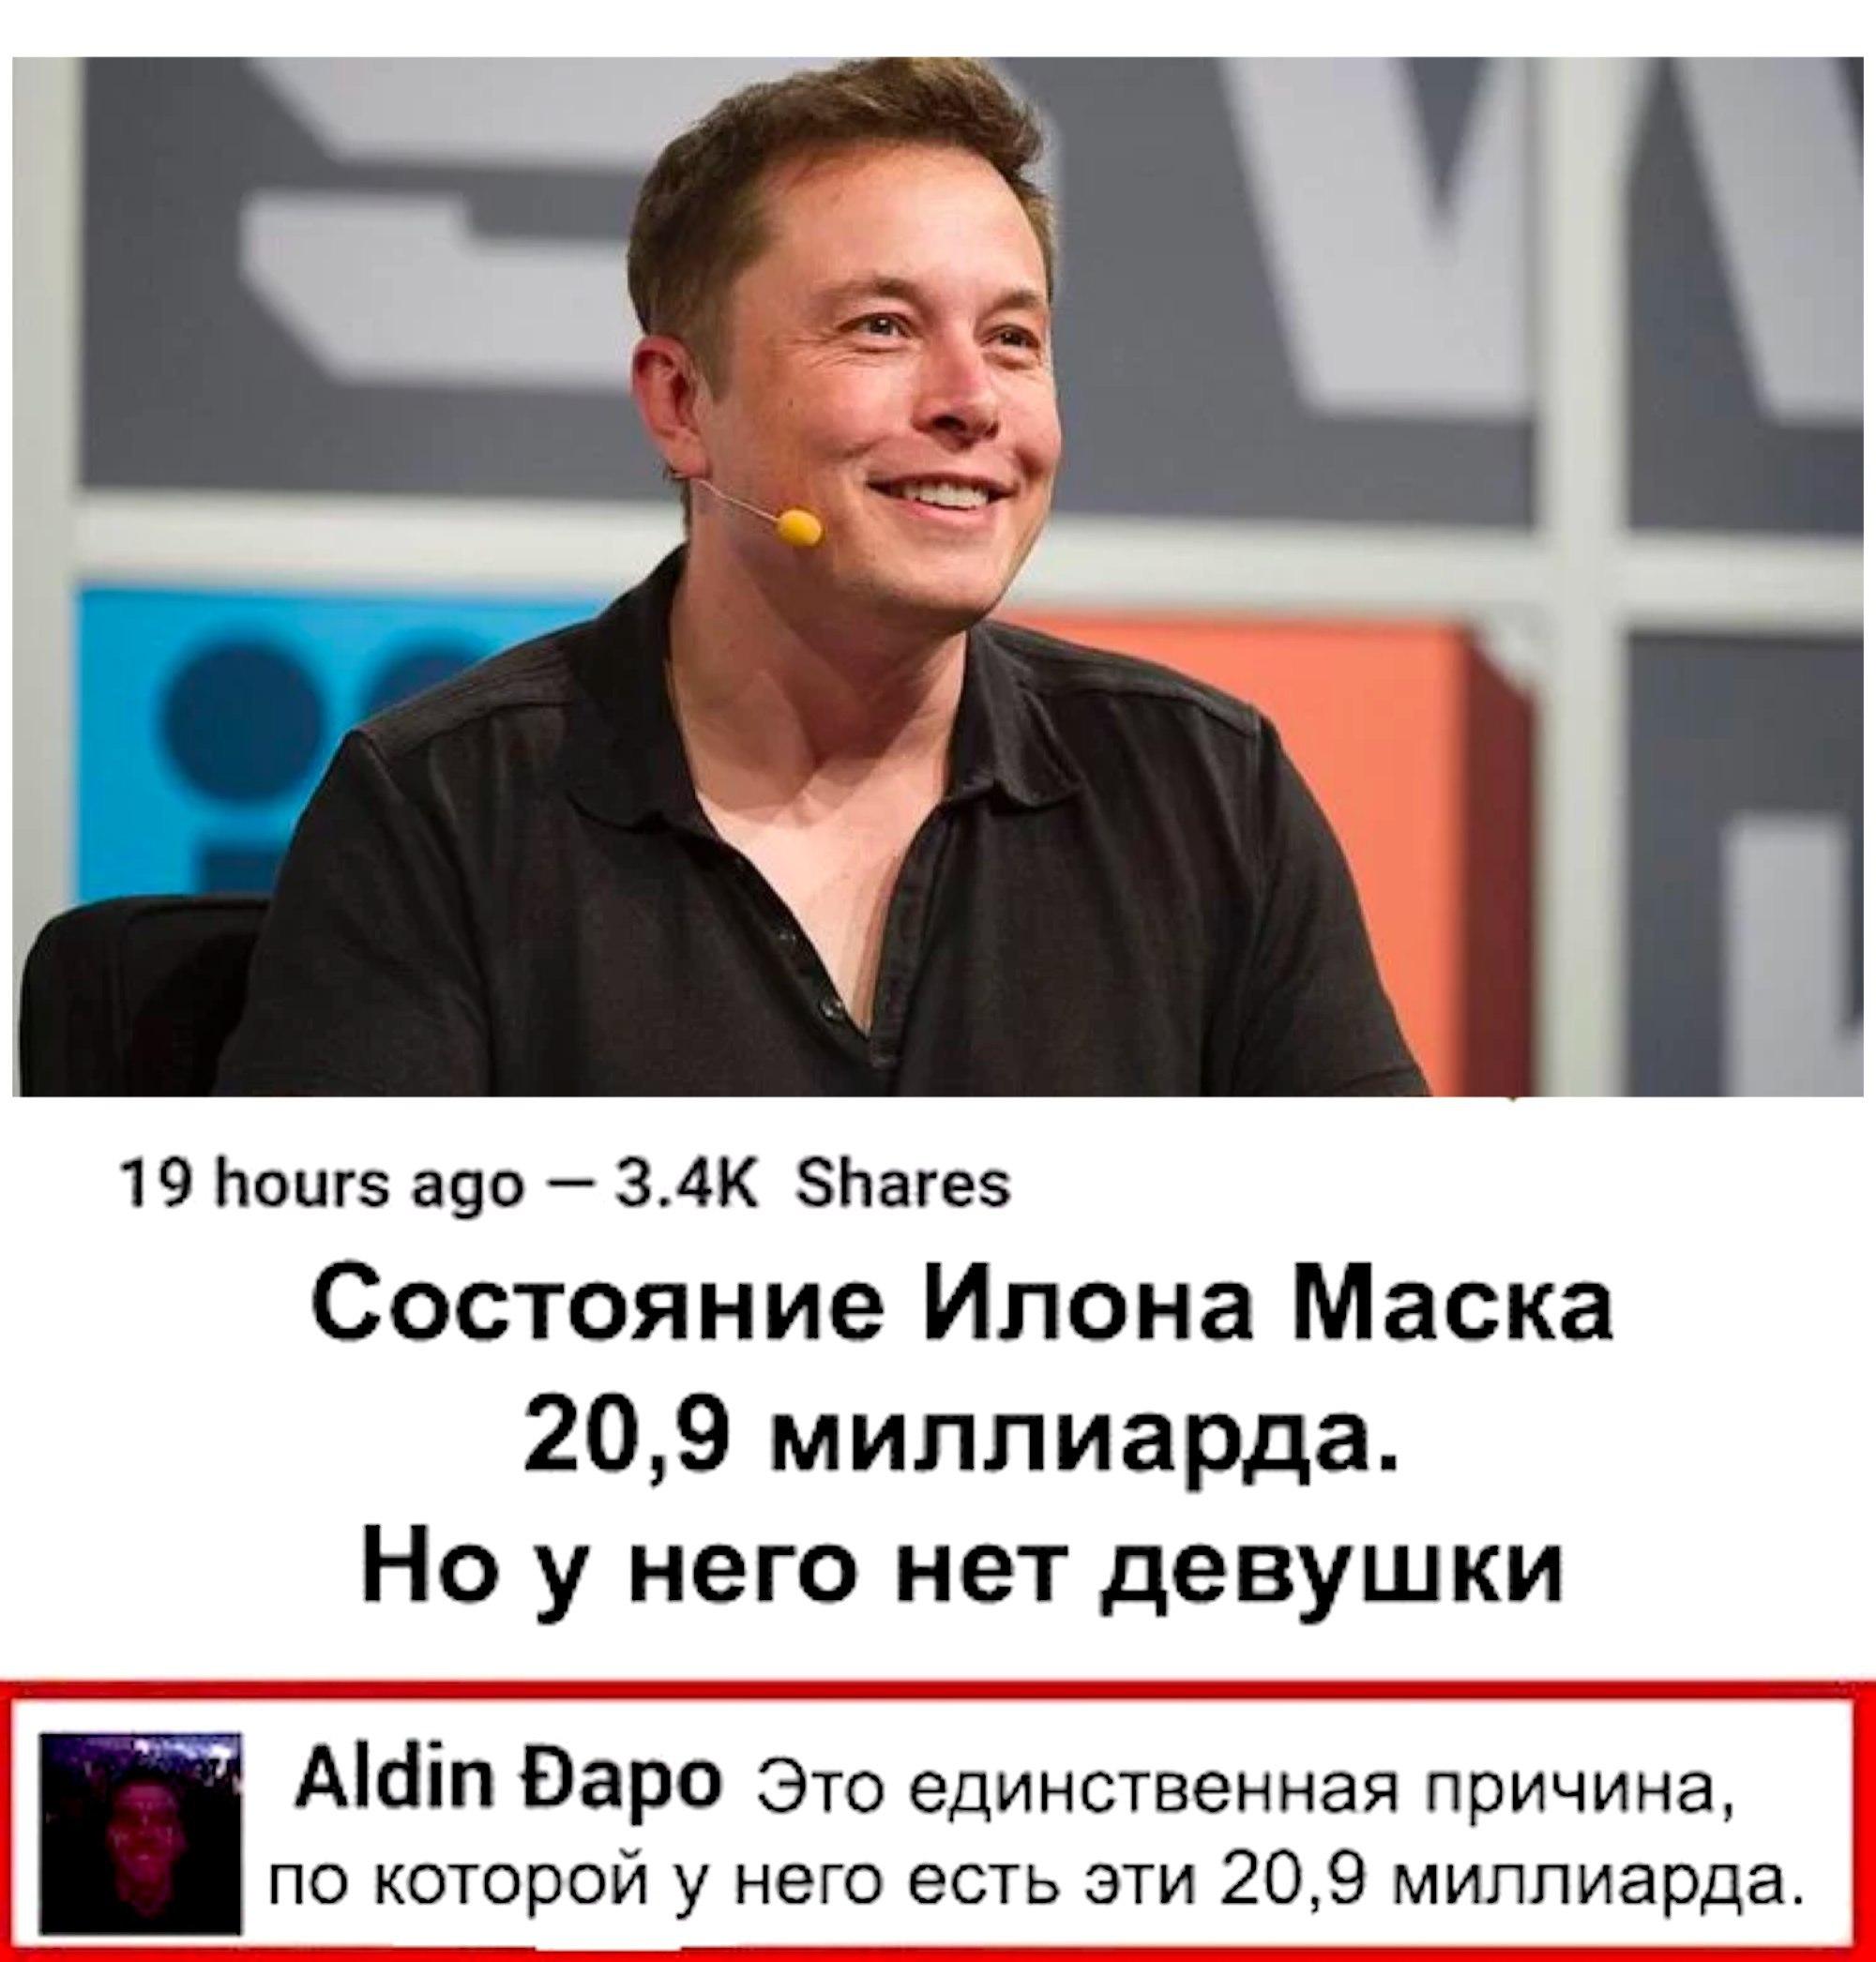 https://pp.userapi.com/c540100/v540100466/4c1ff/NSwlkdb6r2U.jpg